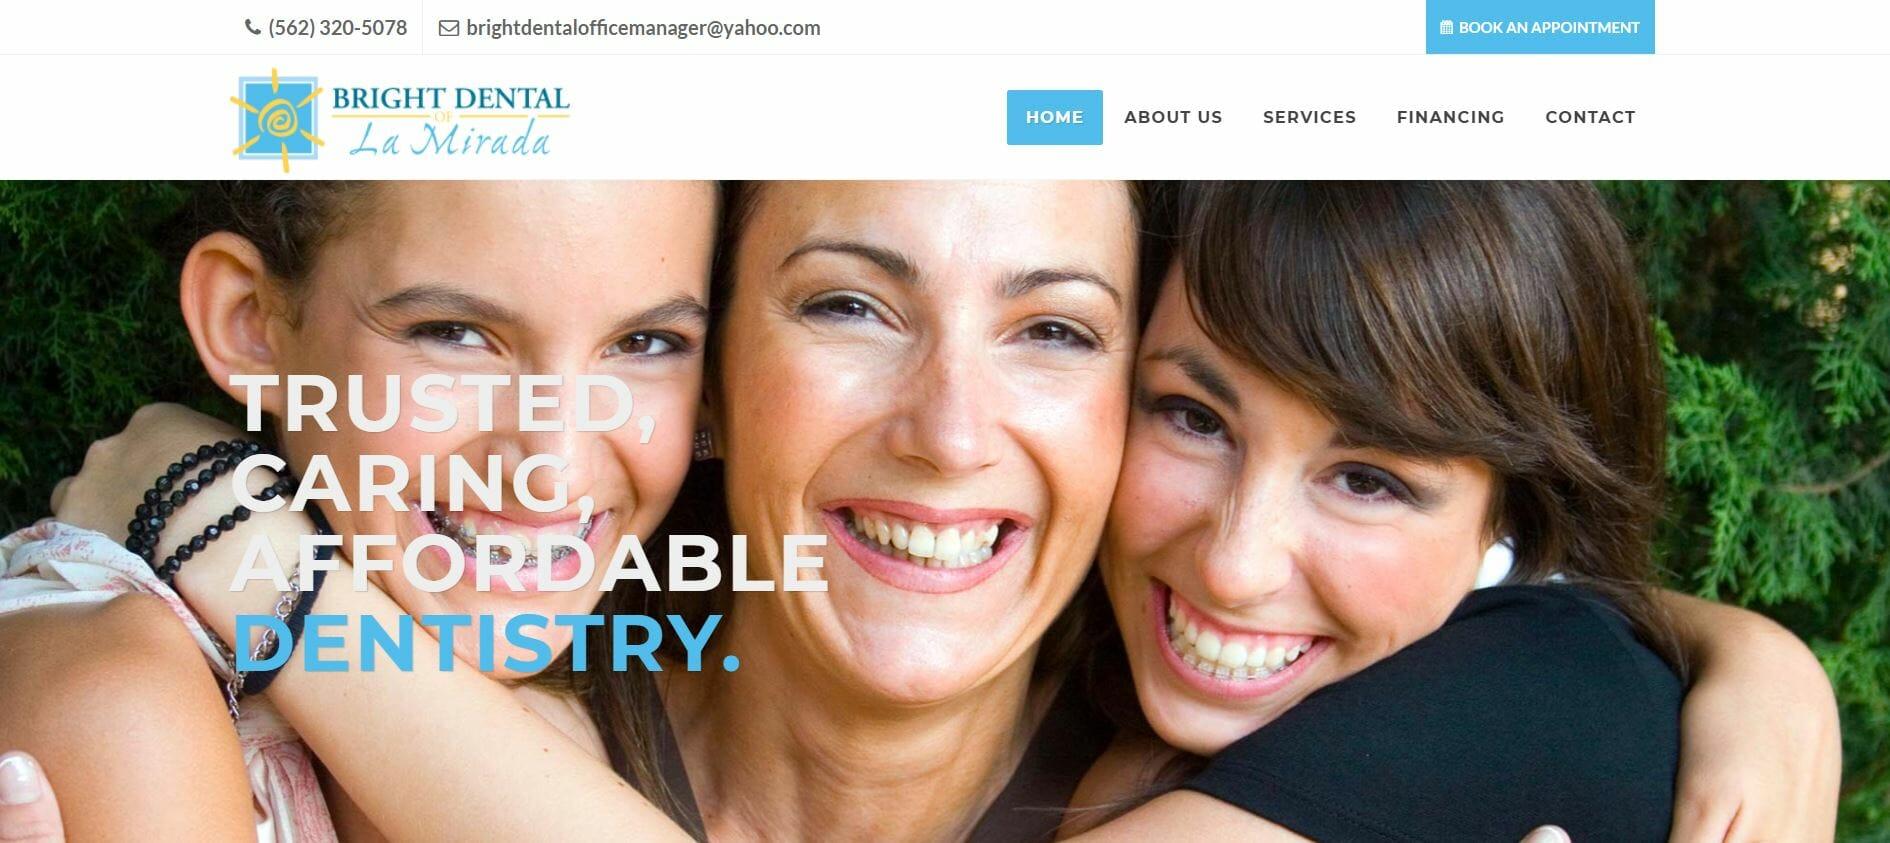 marketing plan for dentist value proposition